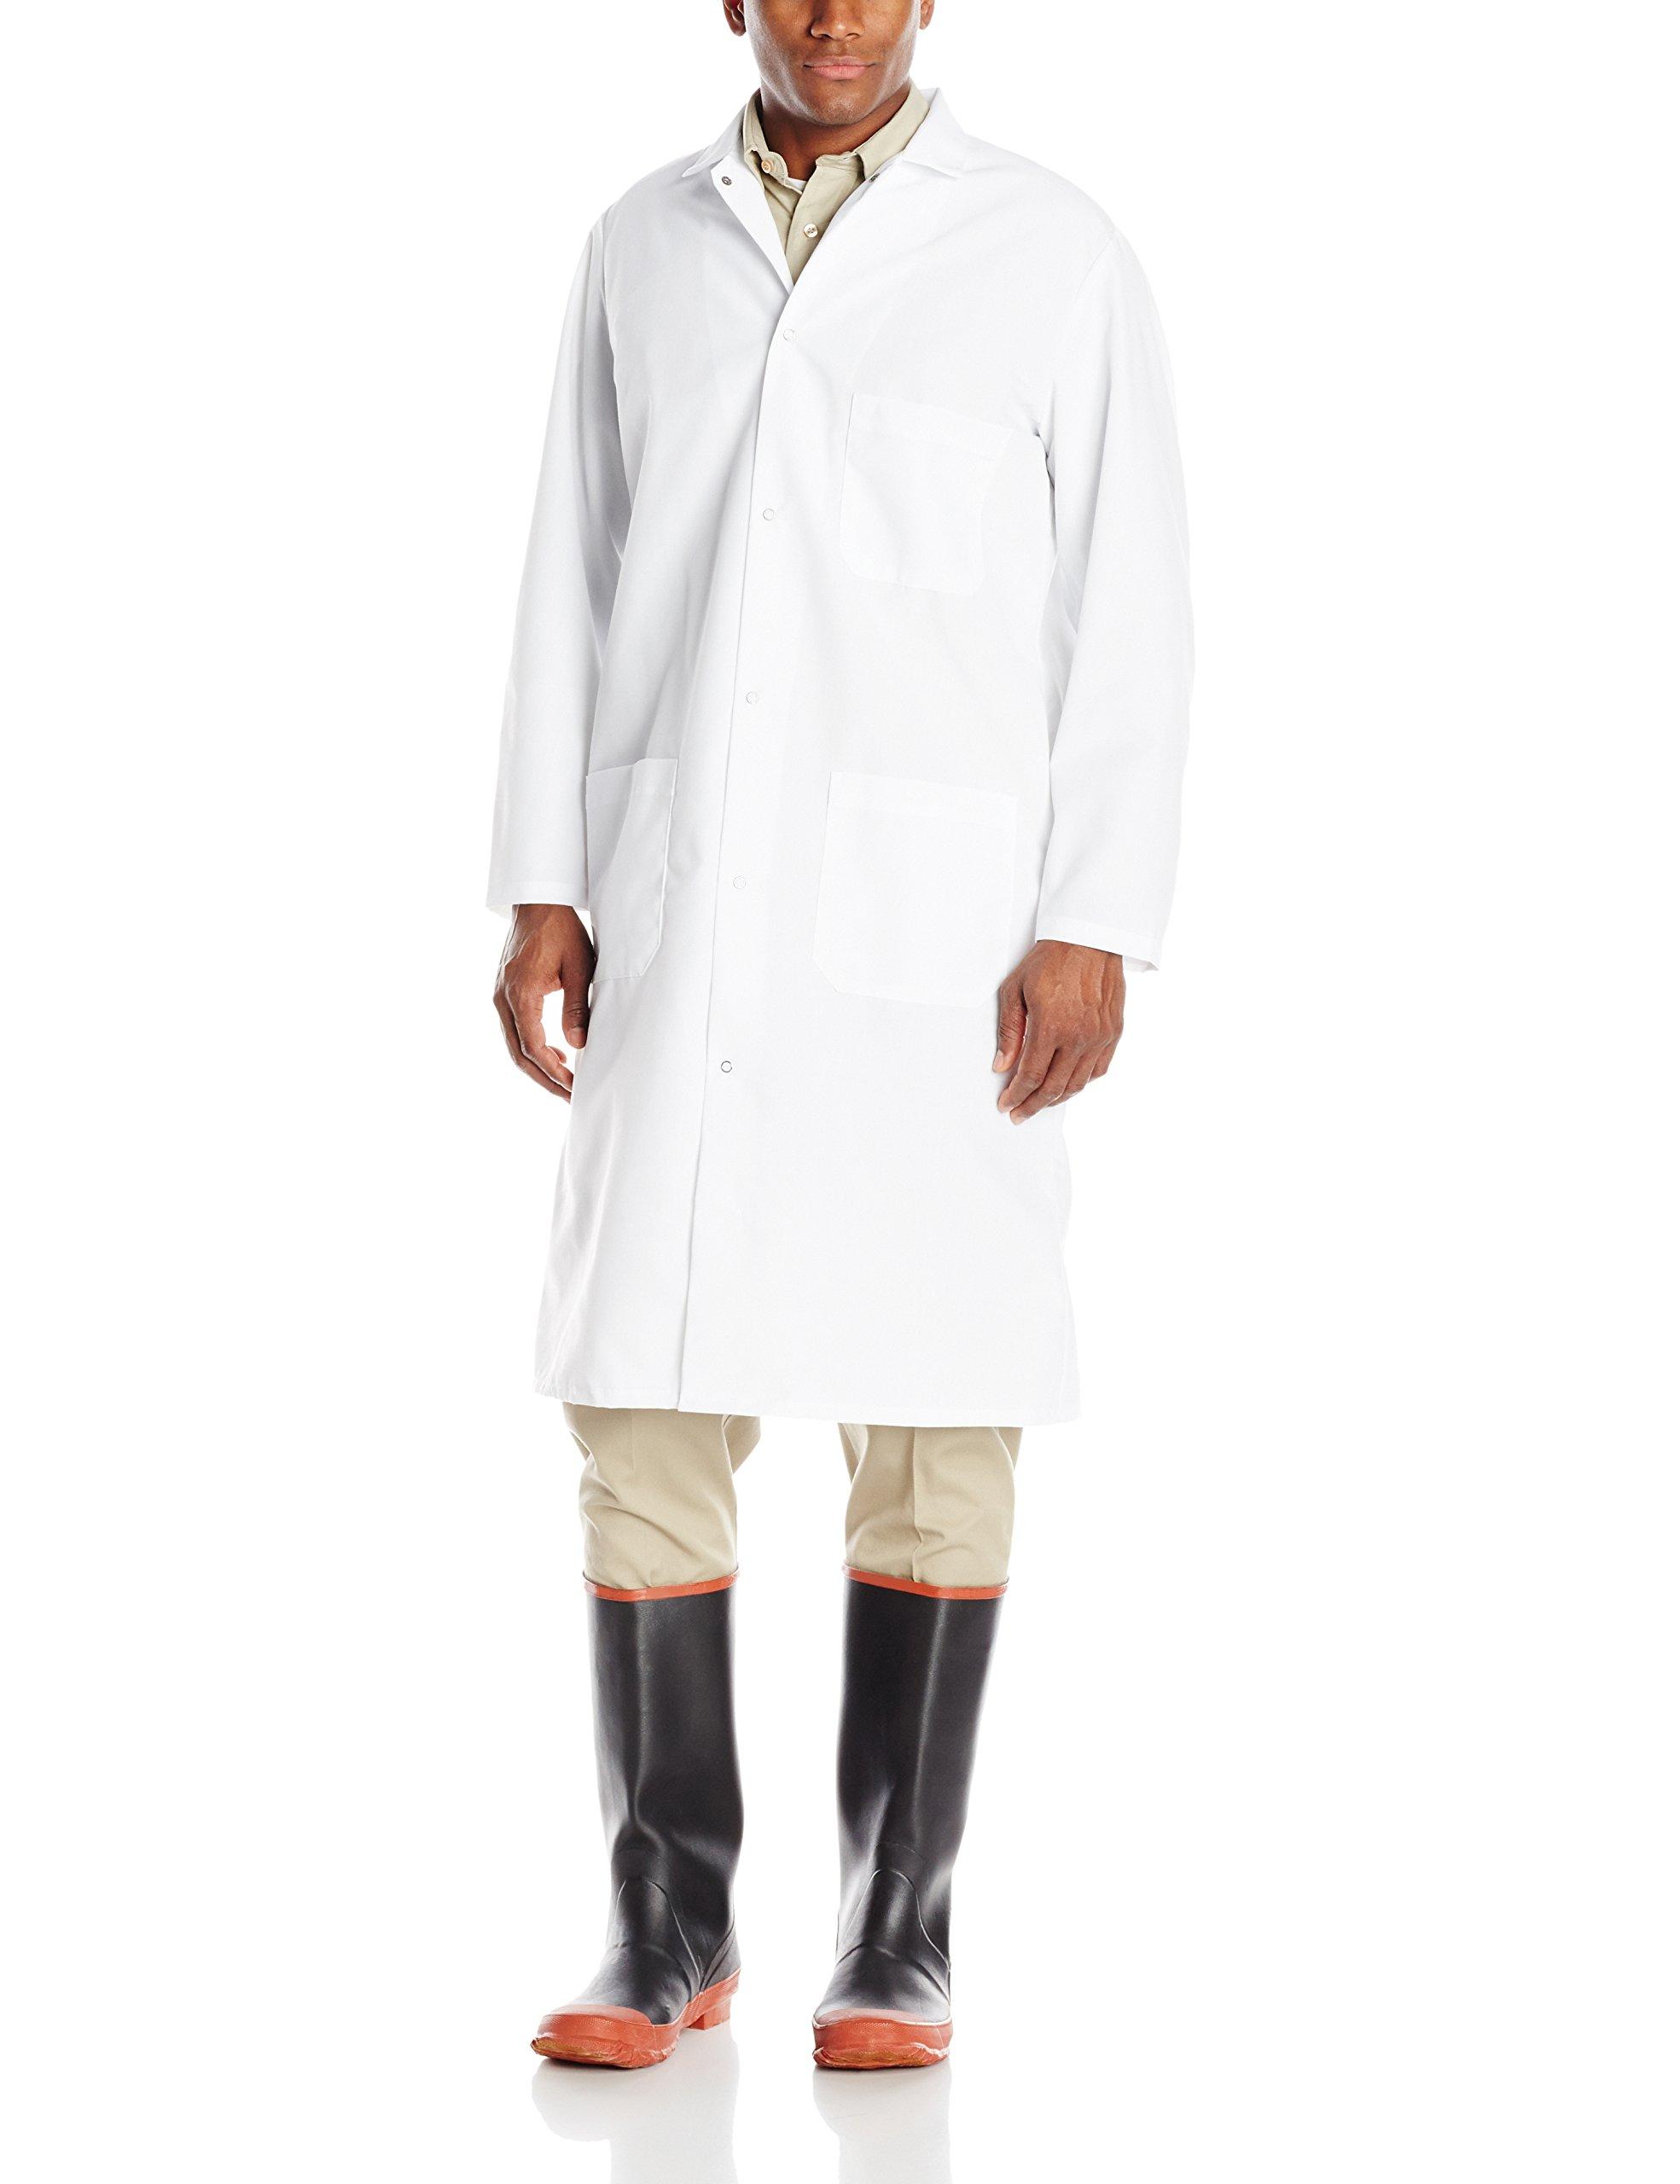 Red Kap Men's RK Gripper Front Spun Polyester Butcher Coat